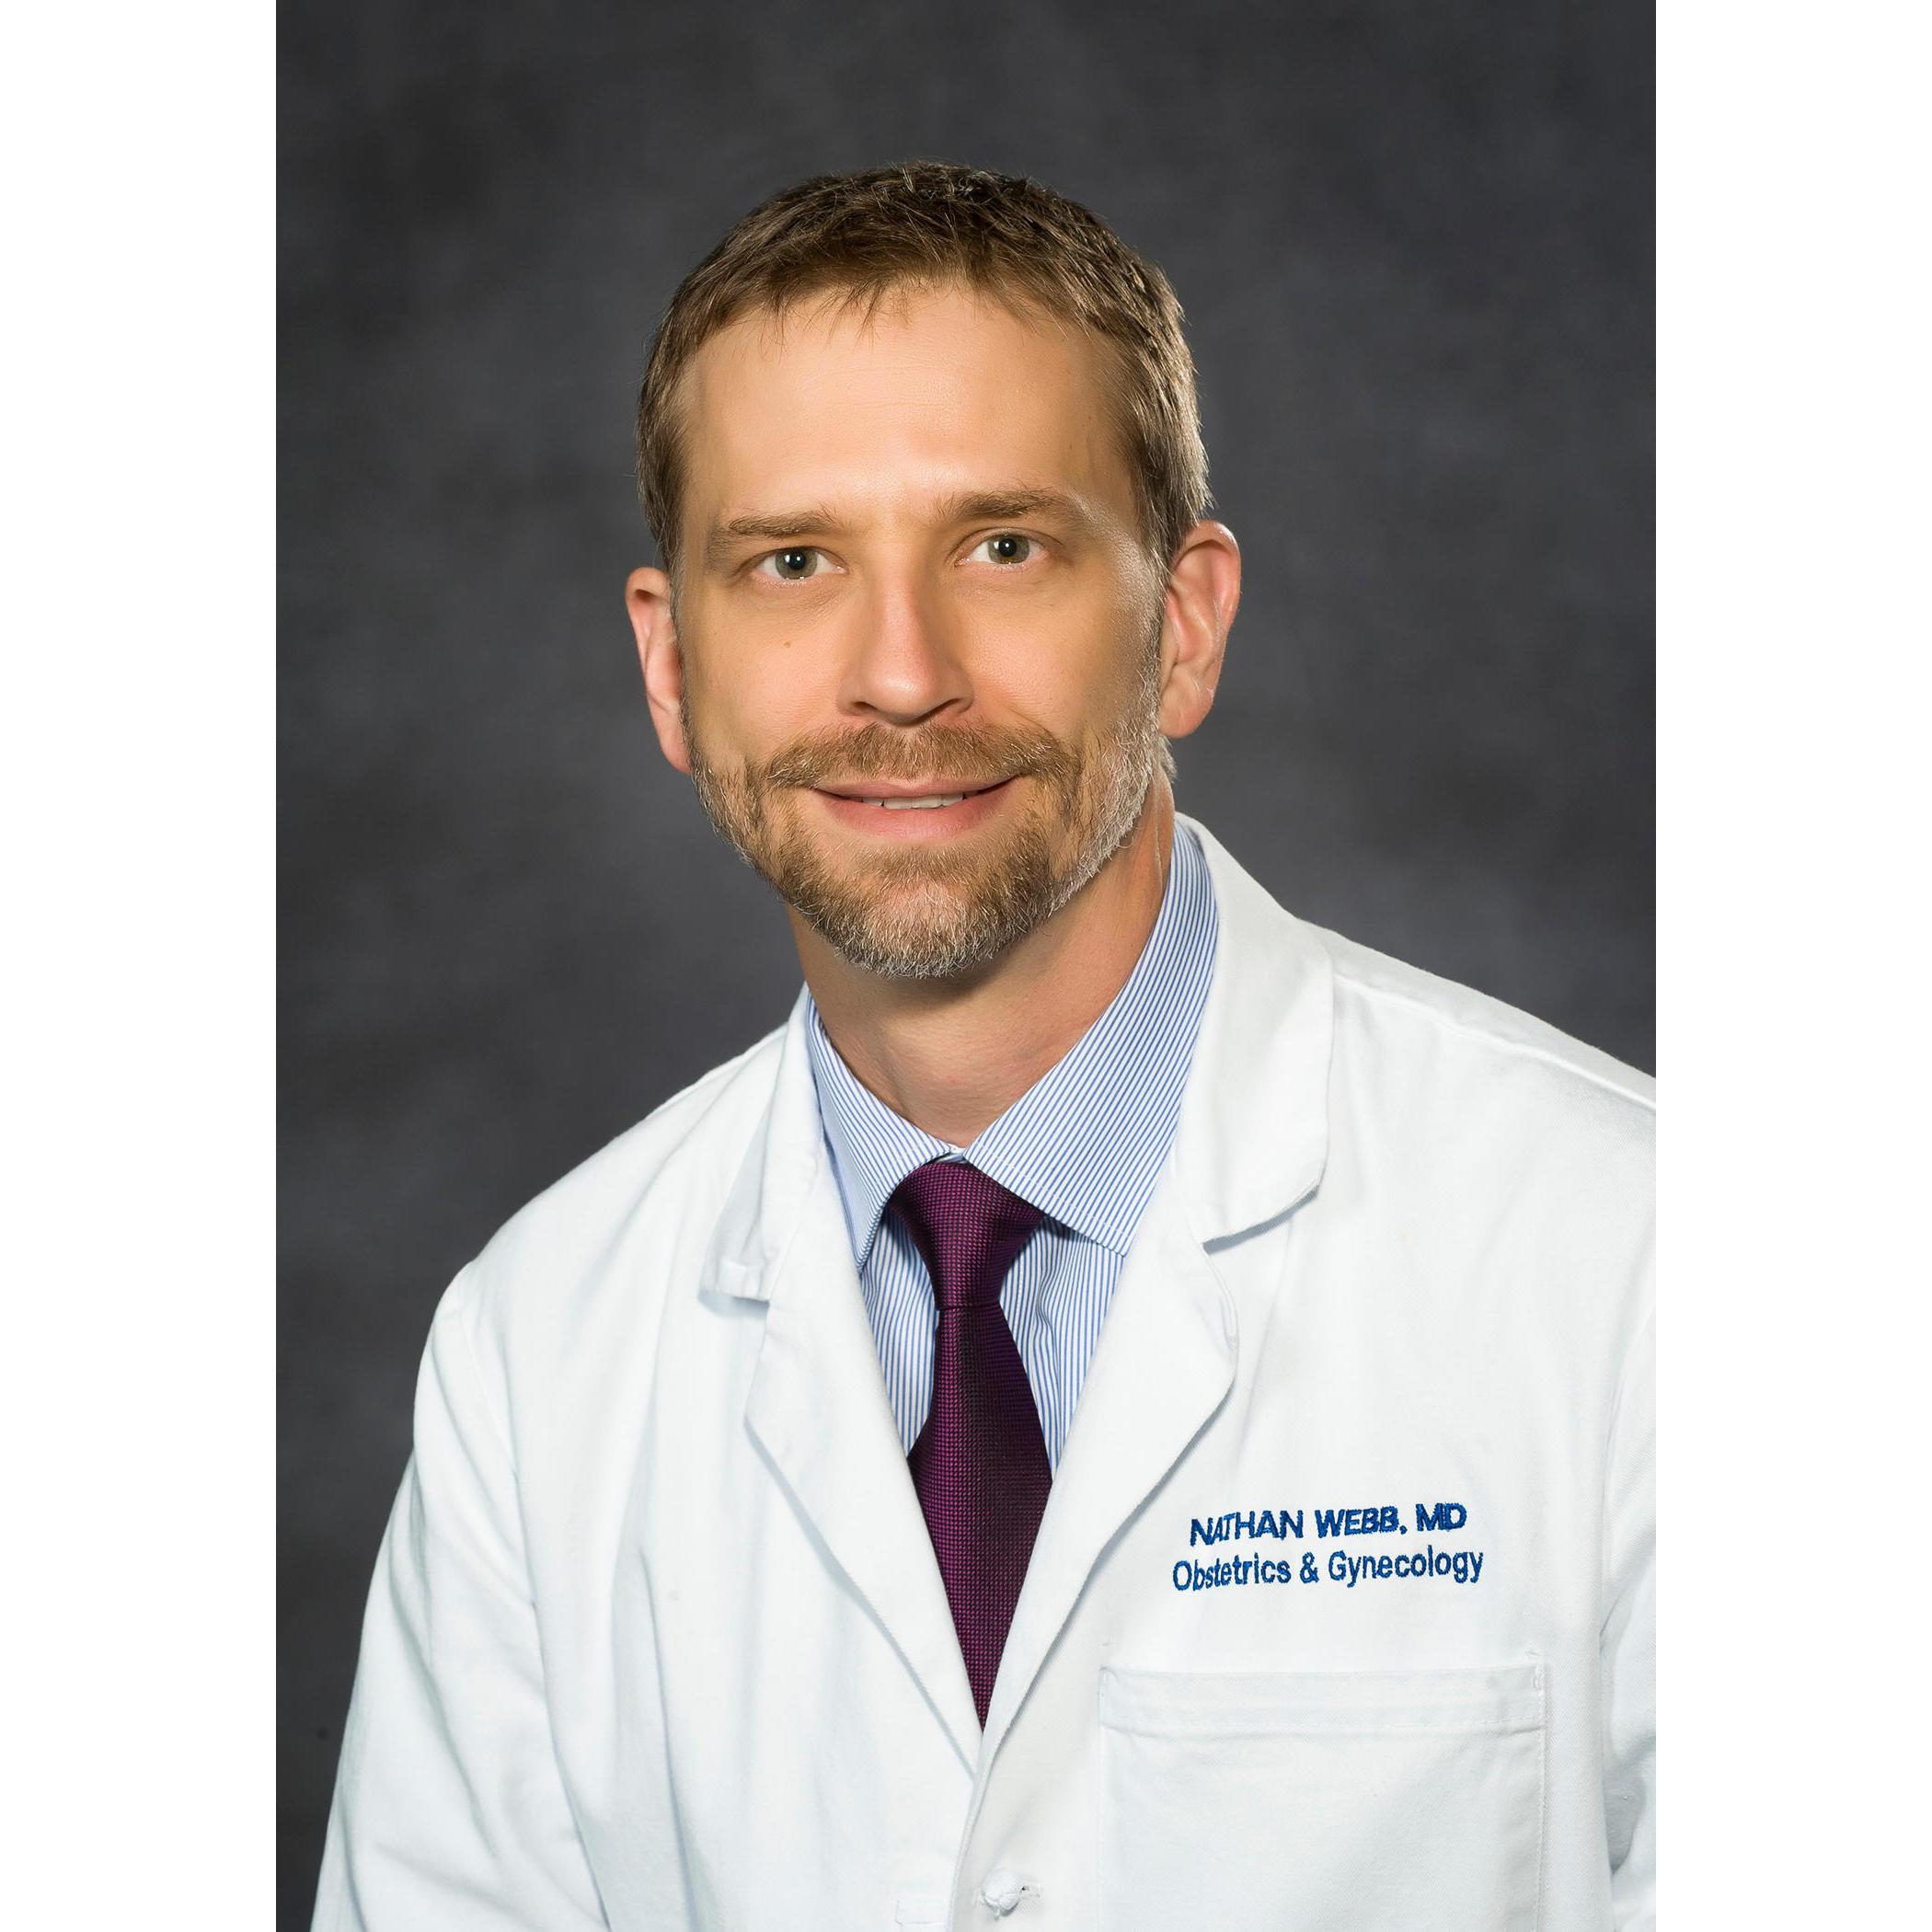 Charles Webb, MD